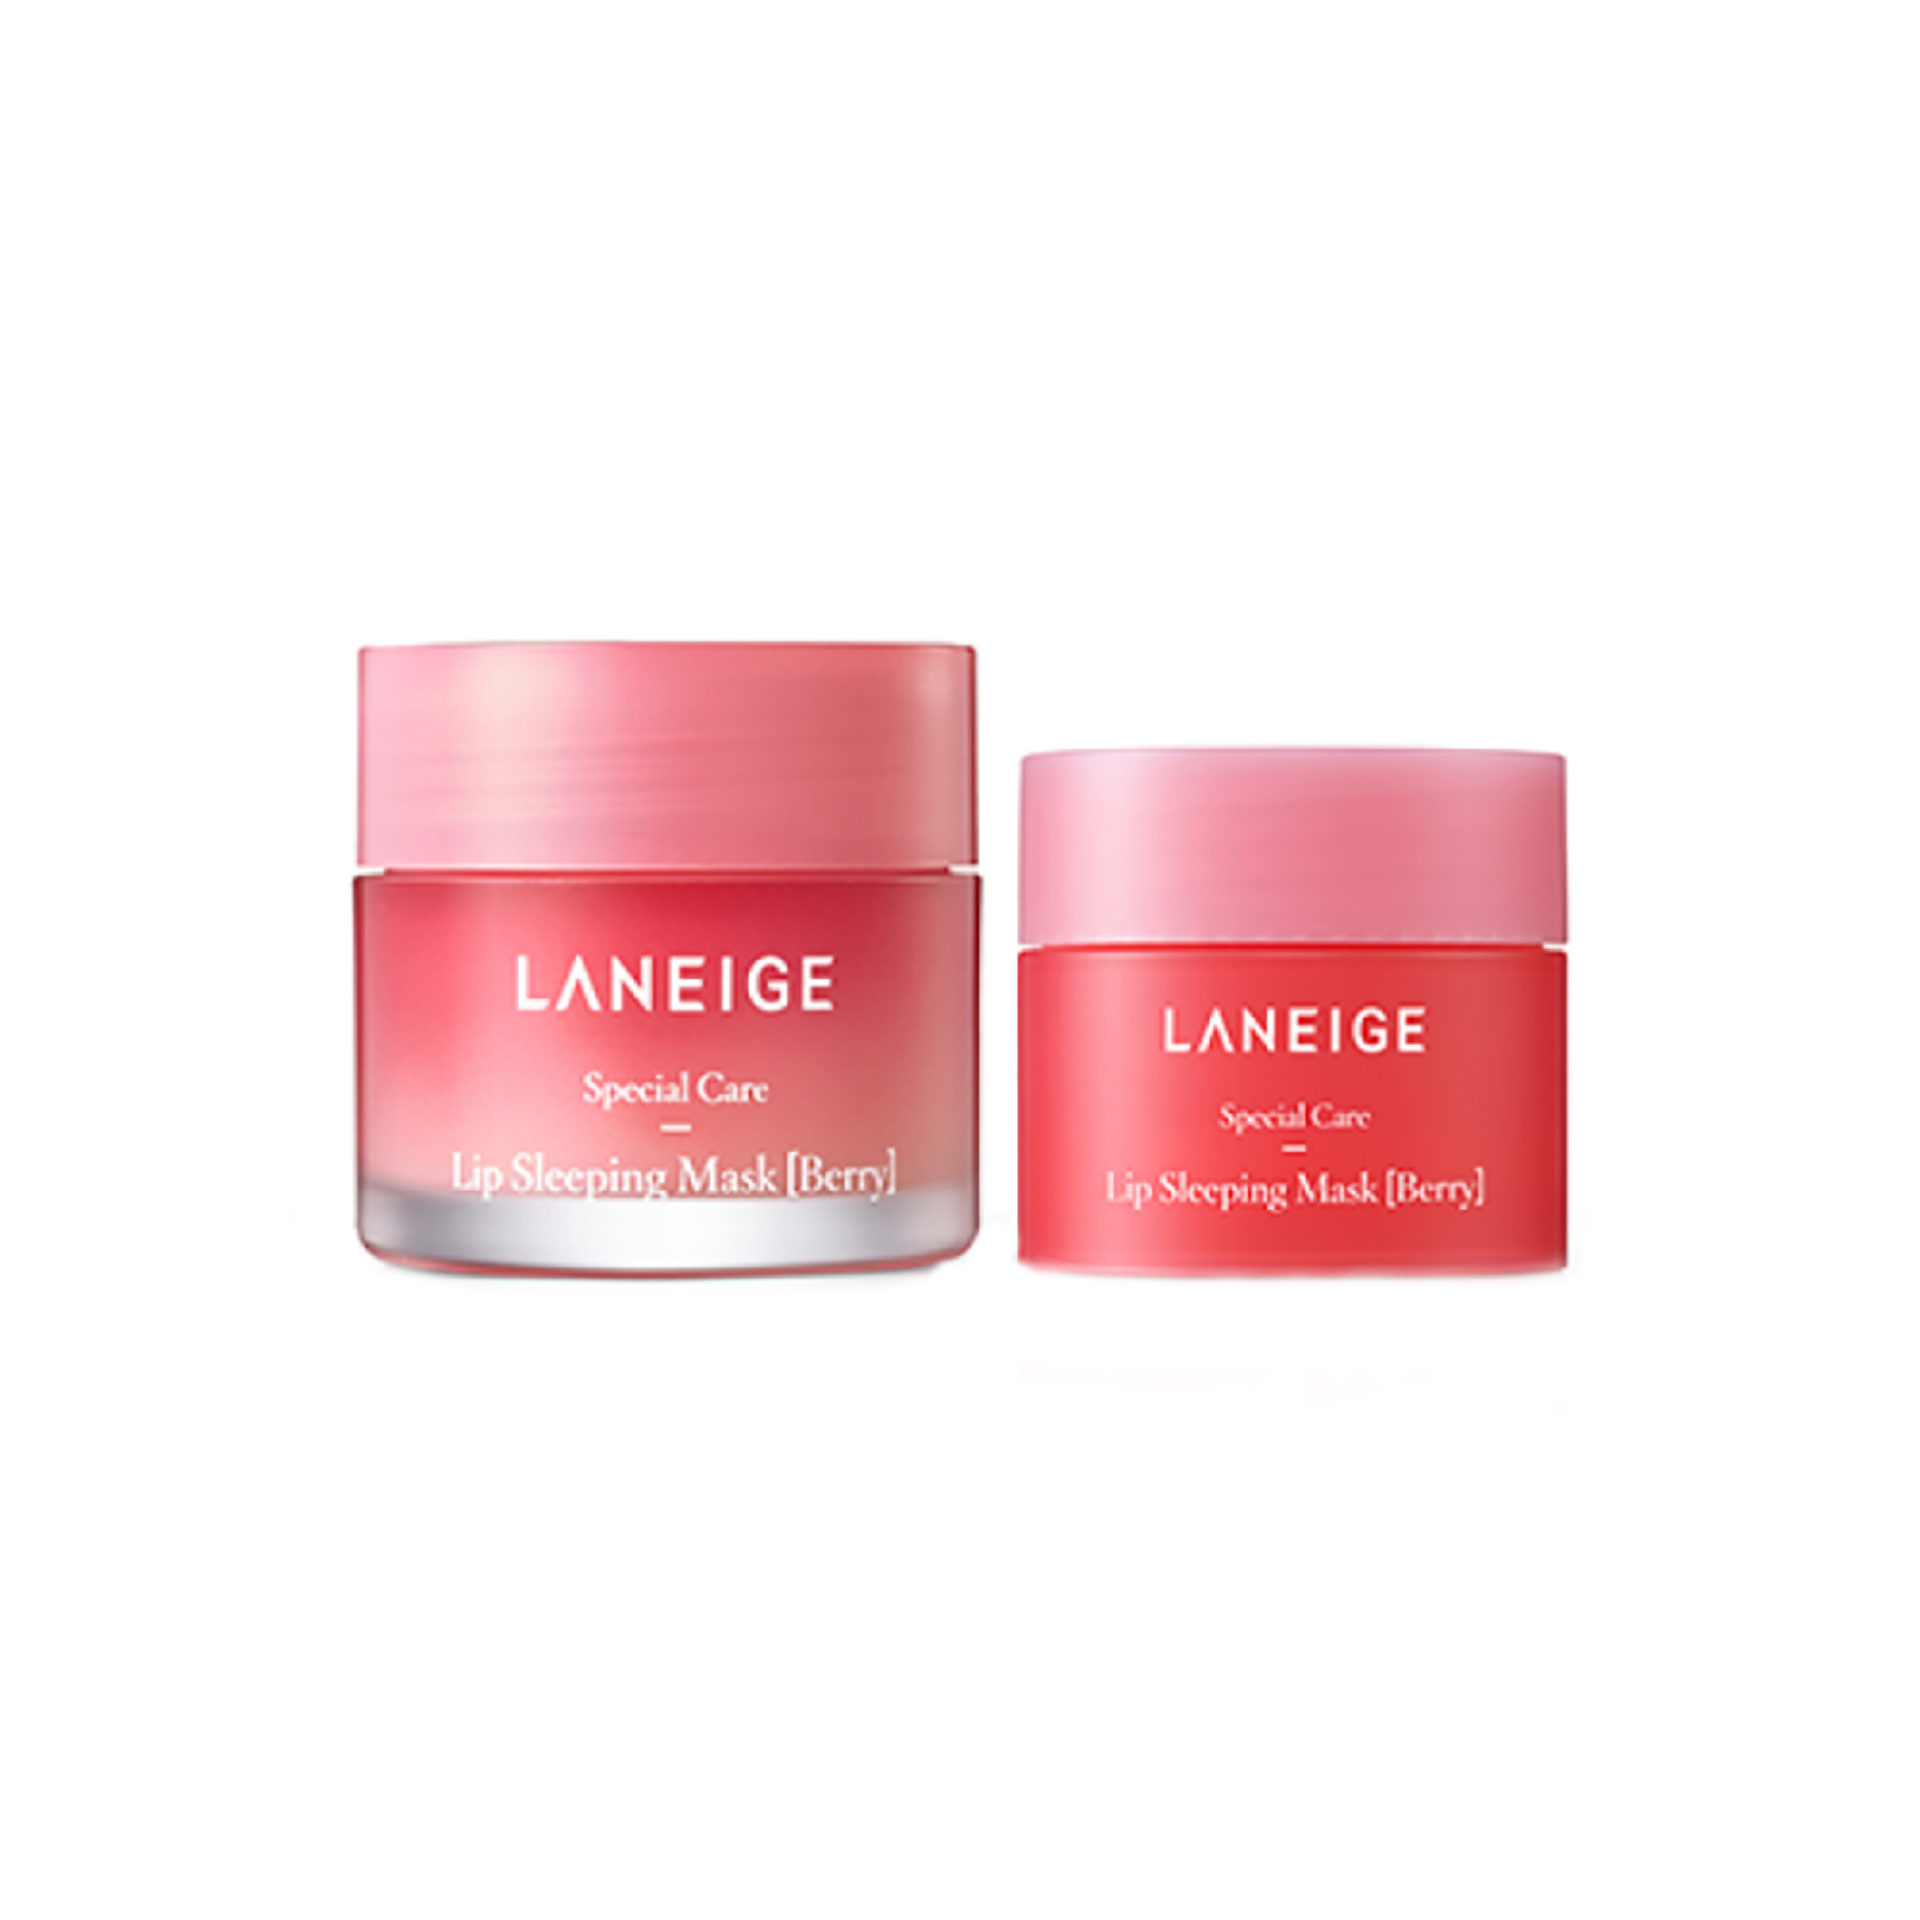 LANEIGE Lip Sleeping Mask Berry kaufen bei Sooyou Korean Cosmetics